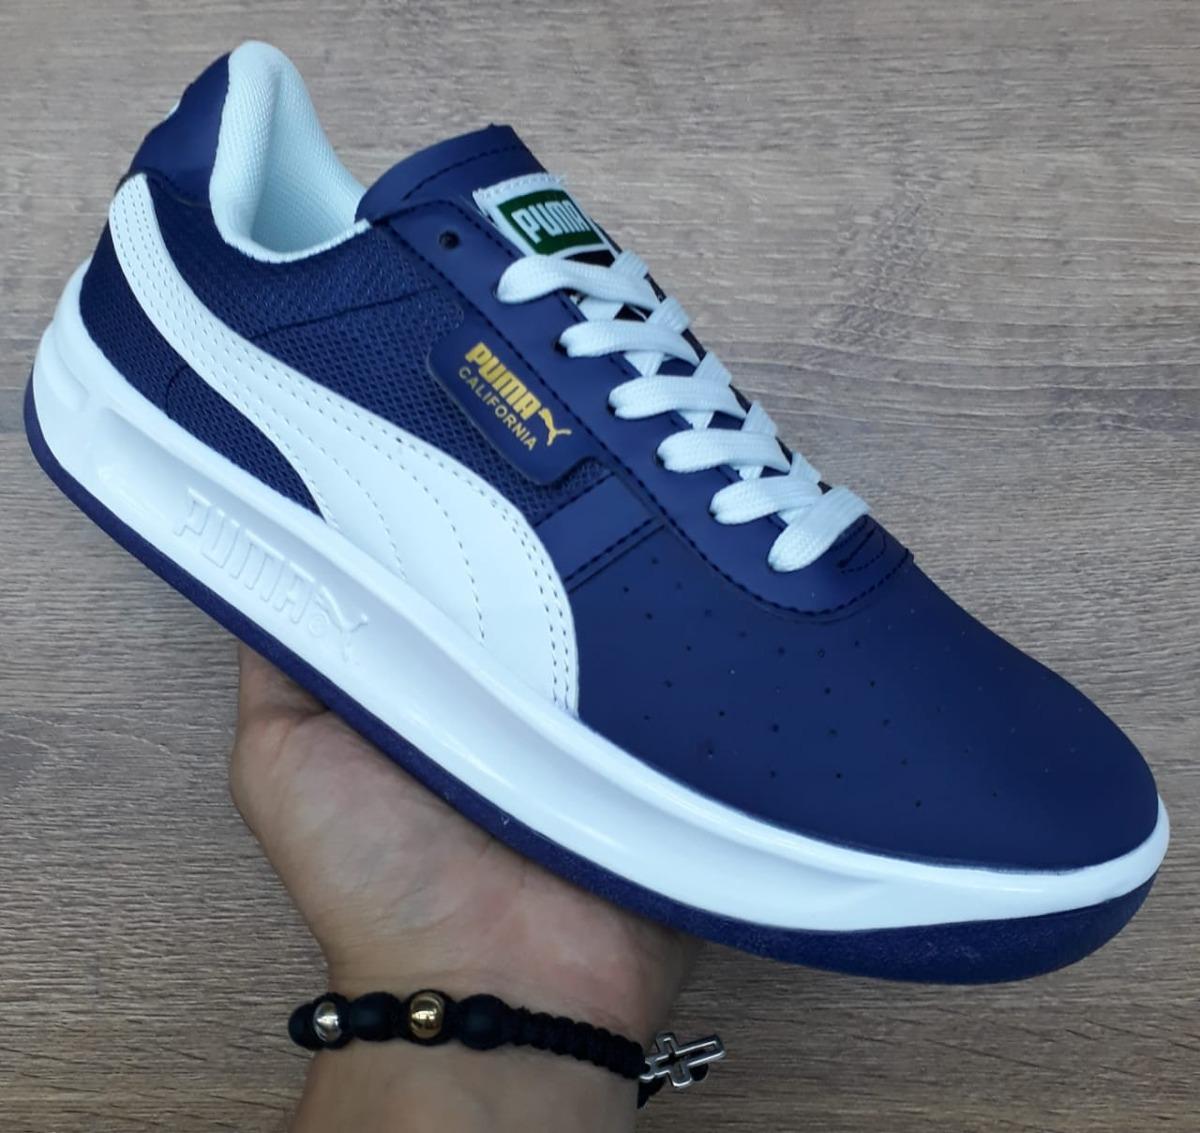 Alta Envio Hombre Suela California Tenis Gratis Zy1 Adidas qc34AR5jL